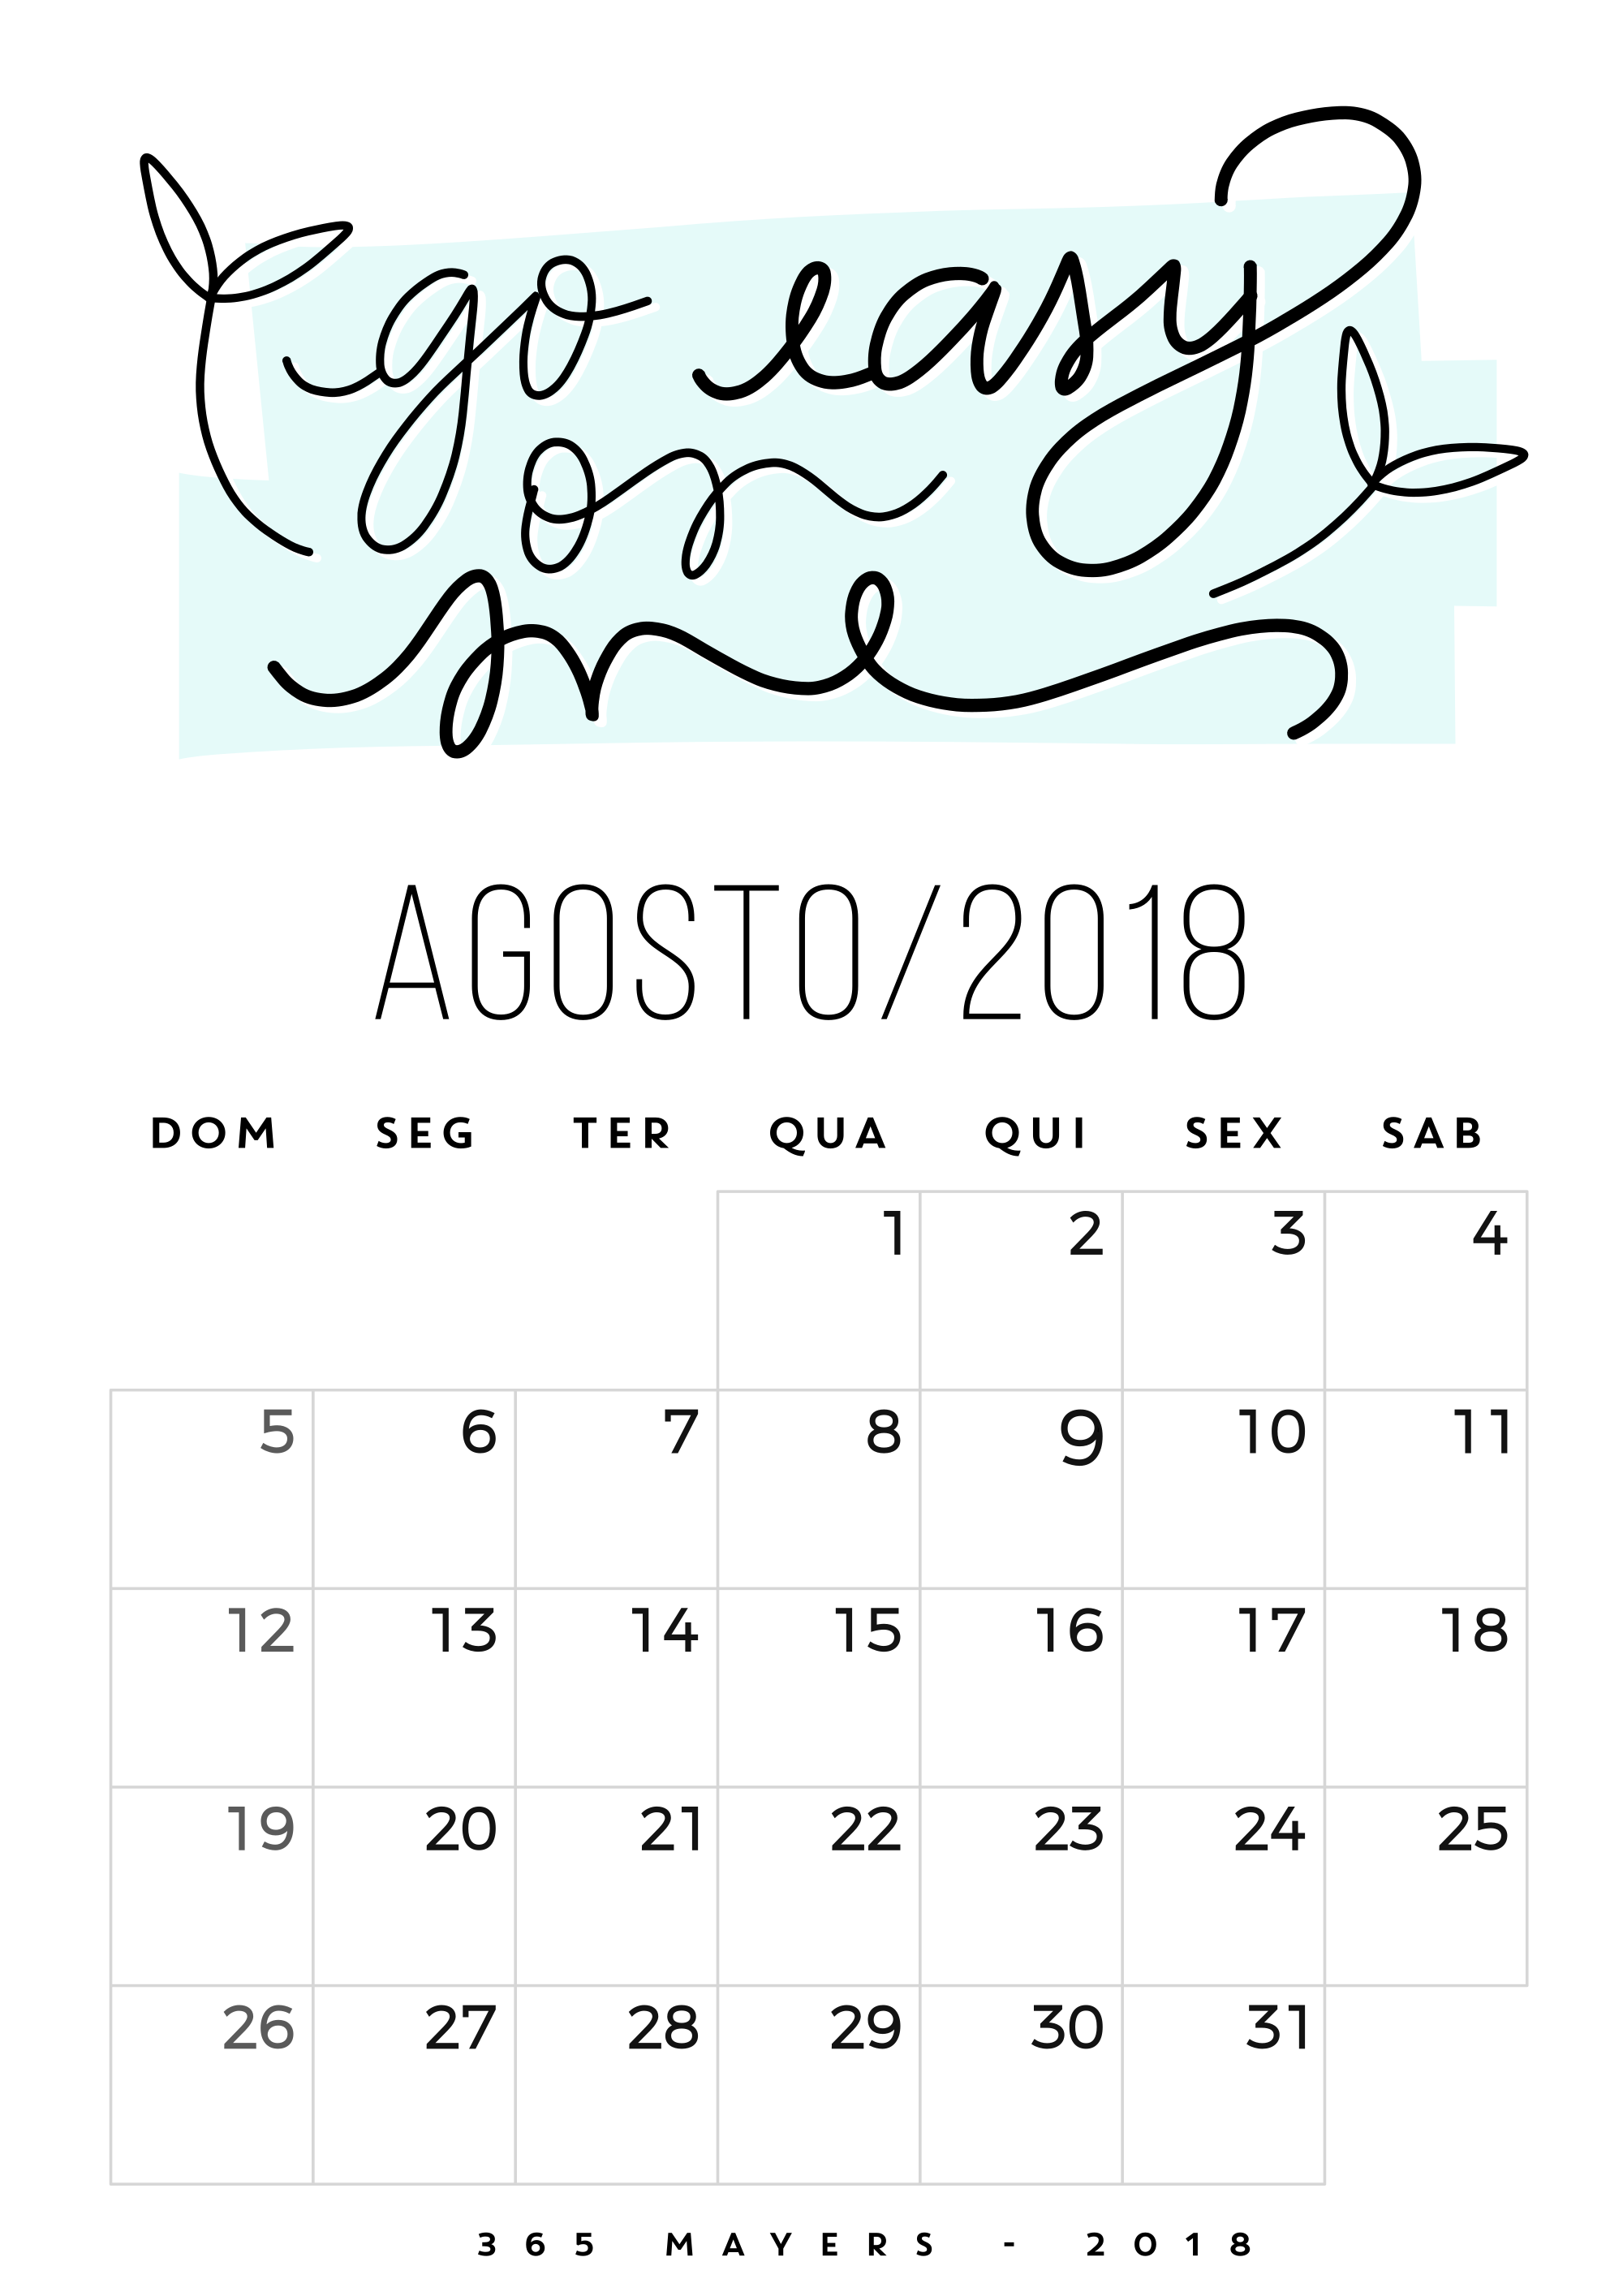 Calendario 365.Calendario 365 Mayers 2018 2 John Mayer John John Mayer